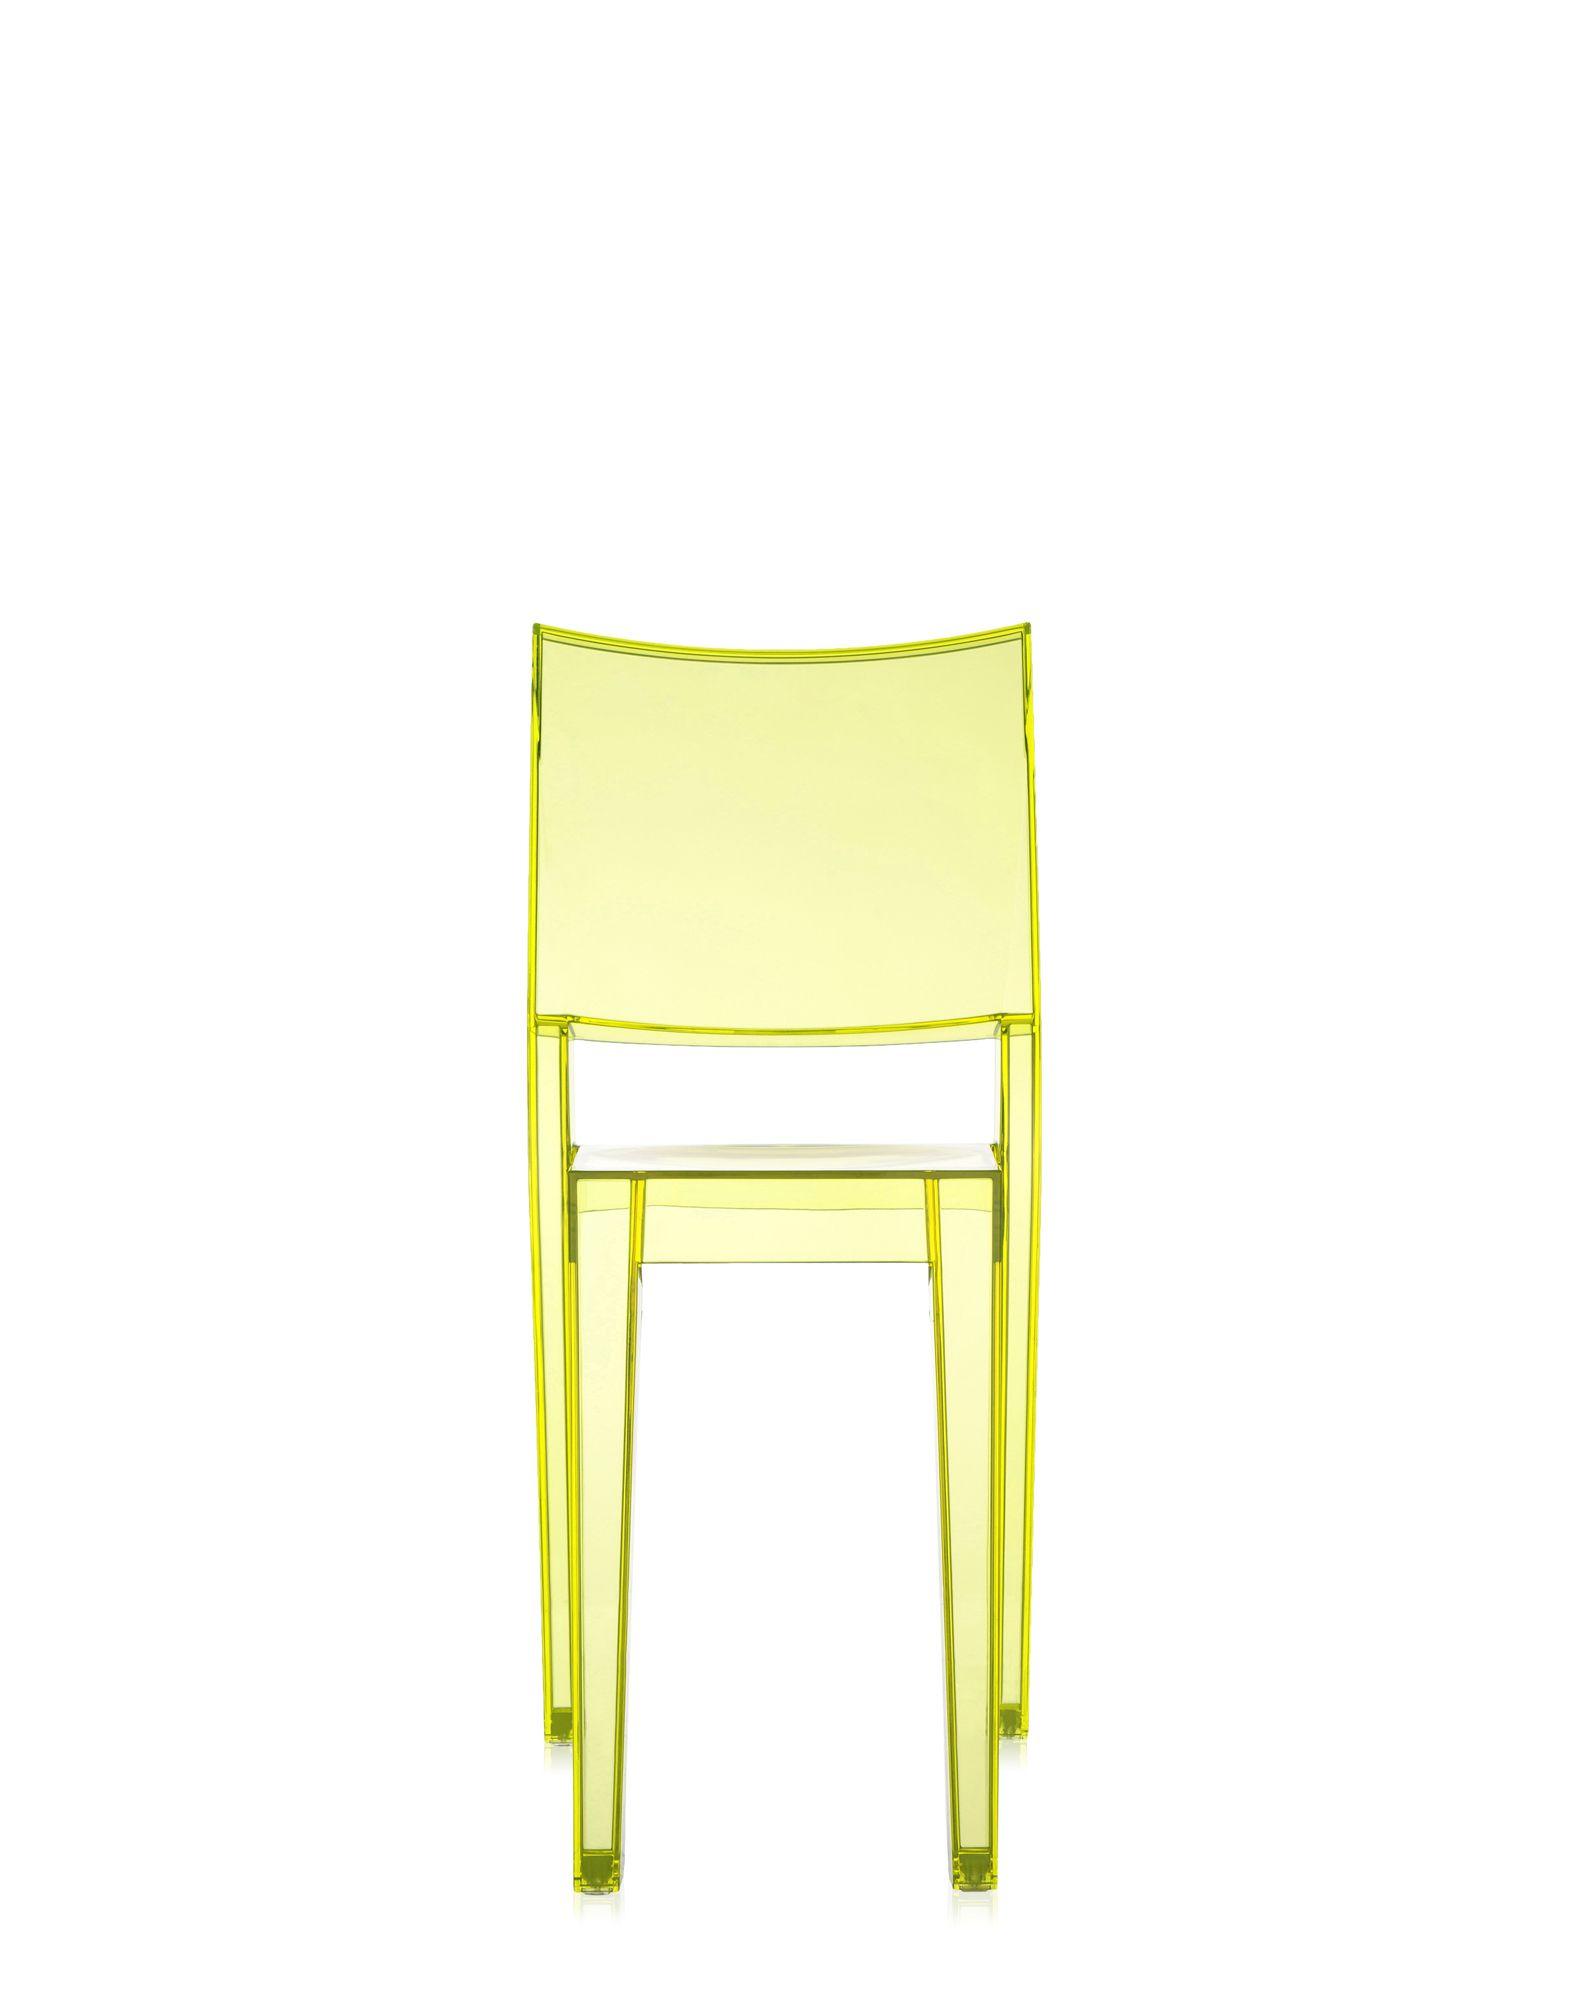 Kartell la marie giallo chiaro sedie design newformsdesign for Sedia kartell la marie